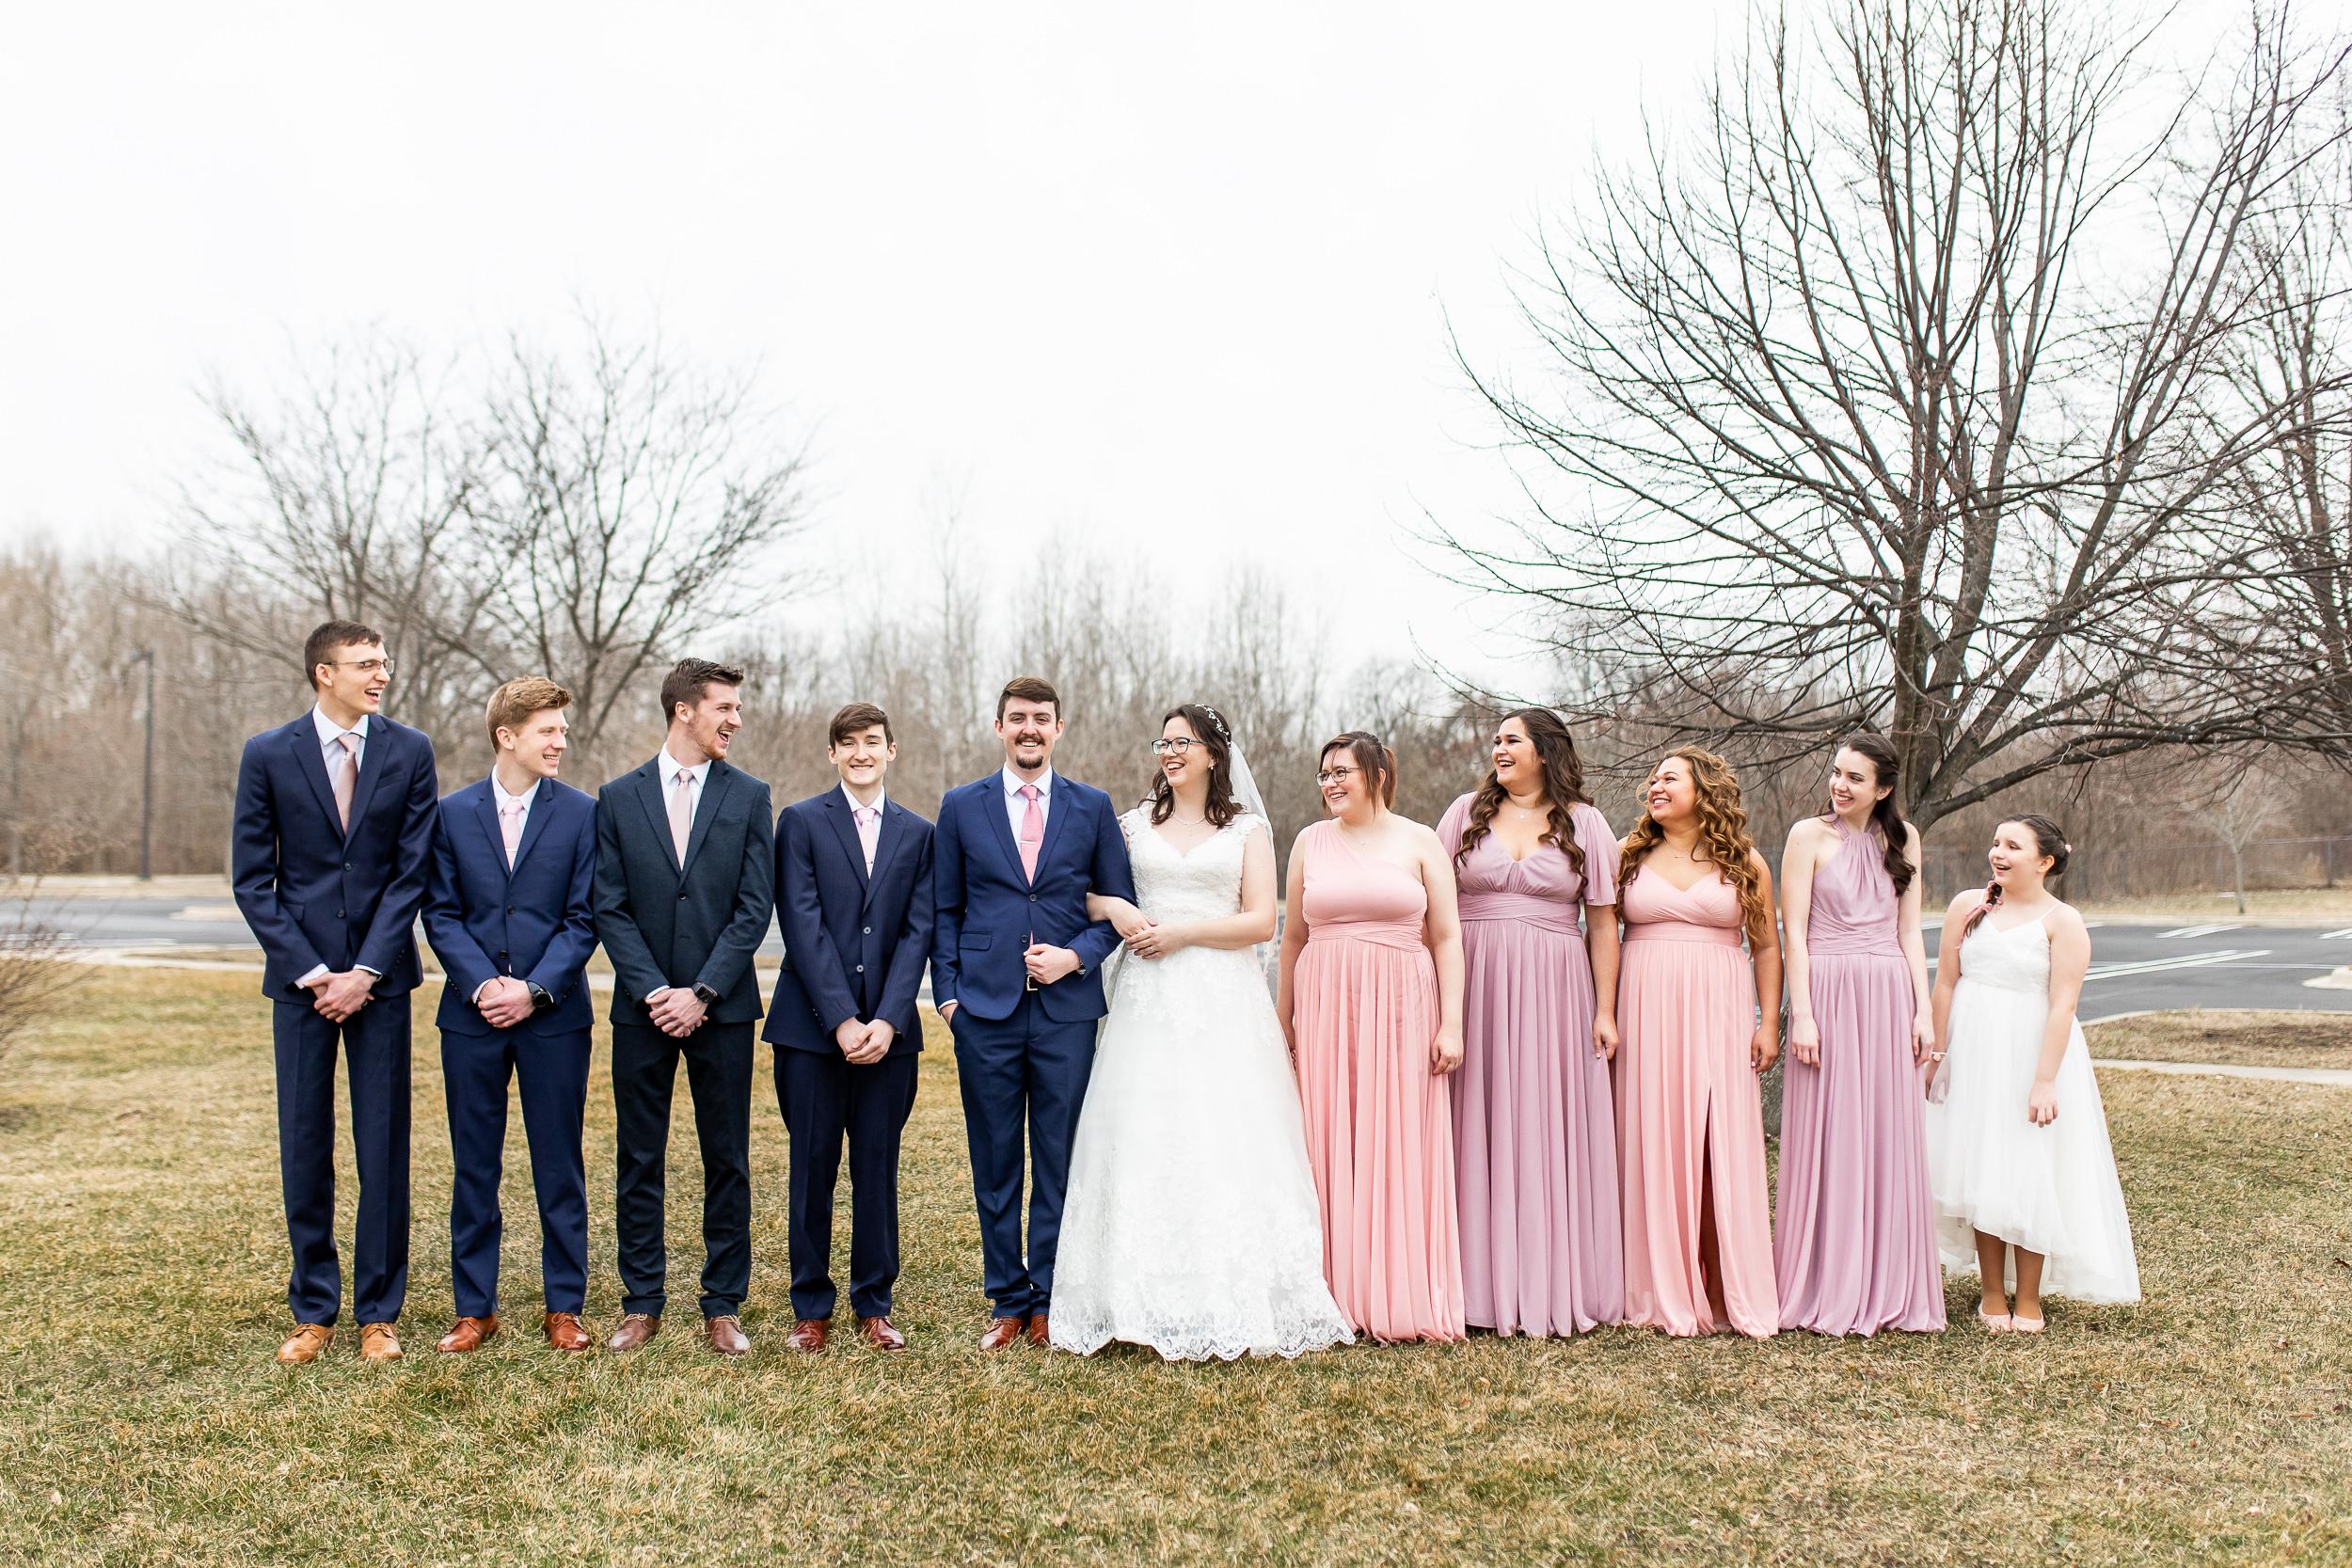 kandra-lynn-photography-michigan-wedding-mar2020-20